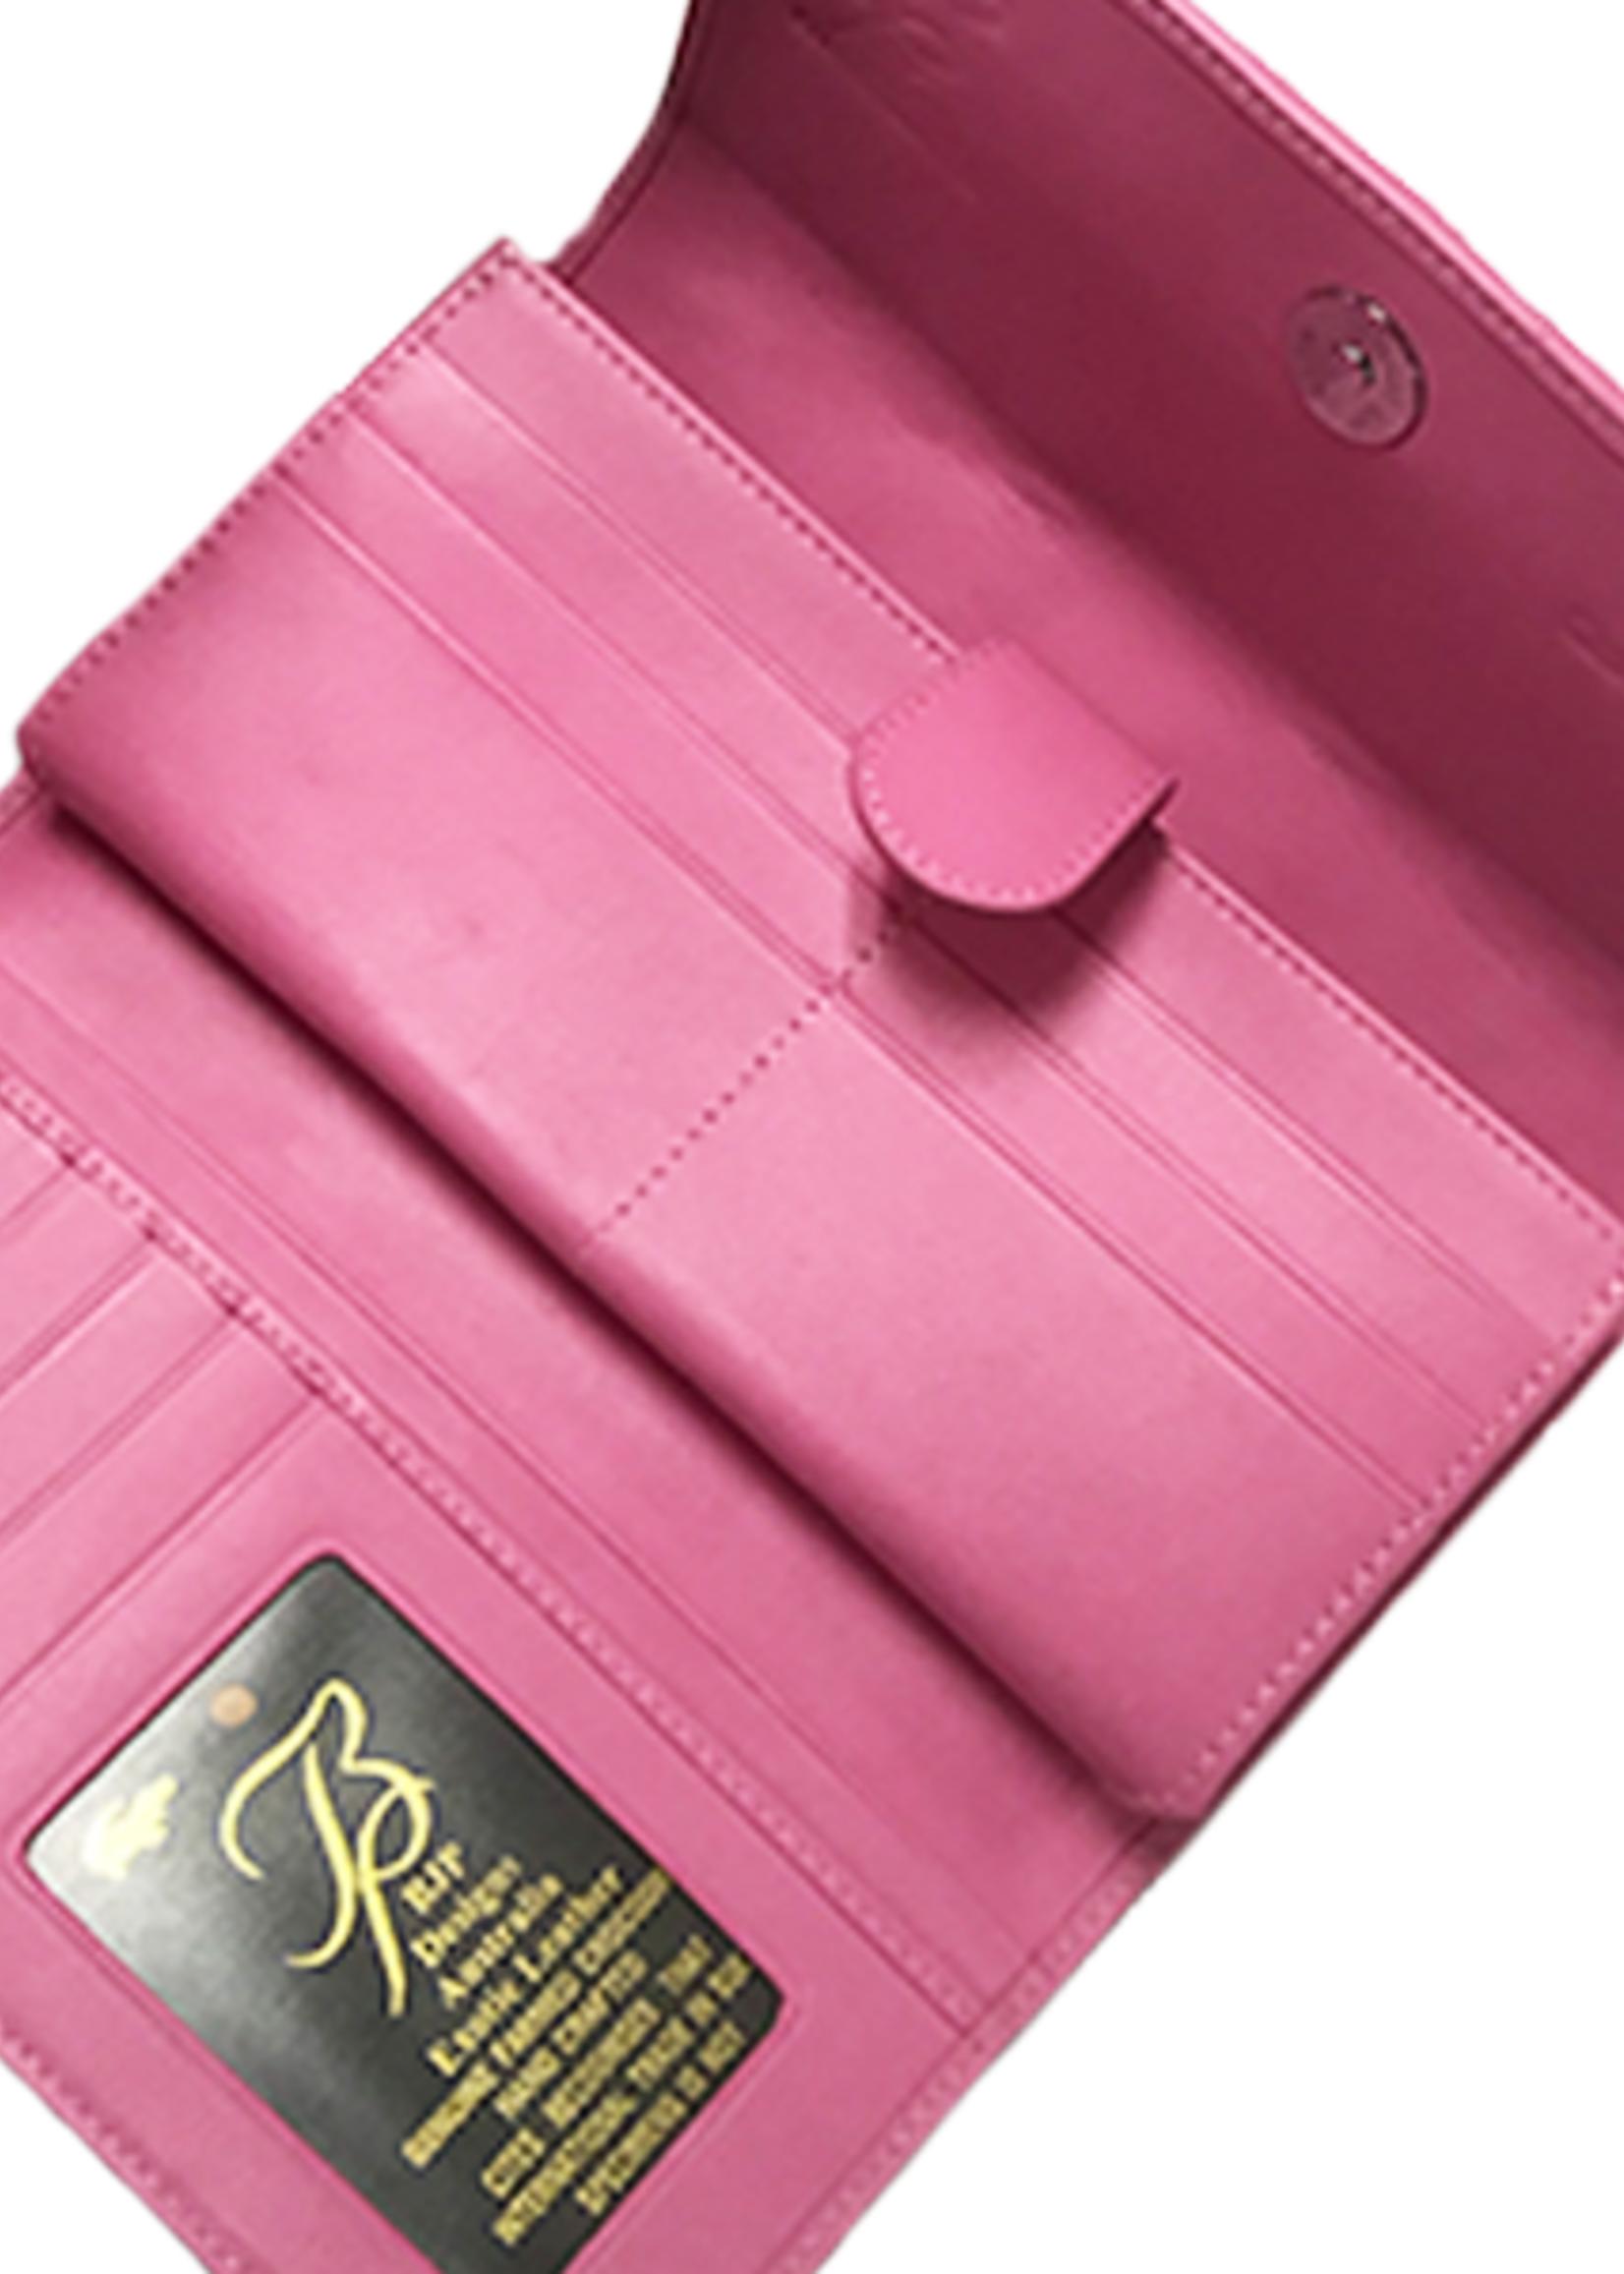 Crocodile & Stingray Products Ladies Crocodile Wallet - Pink